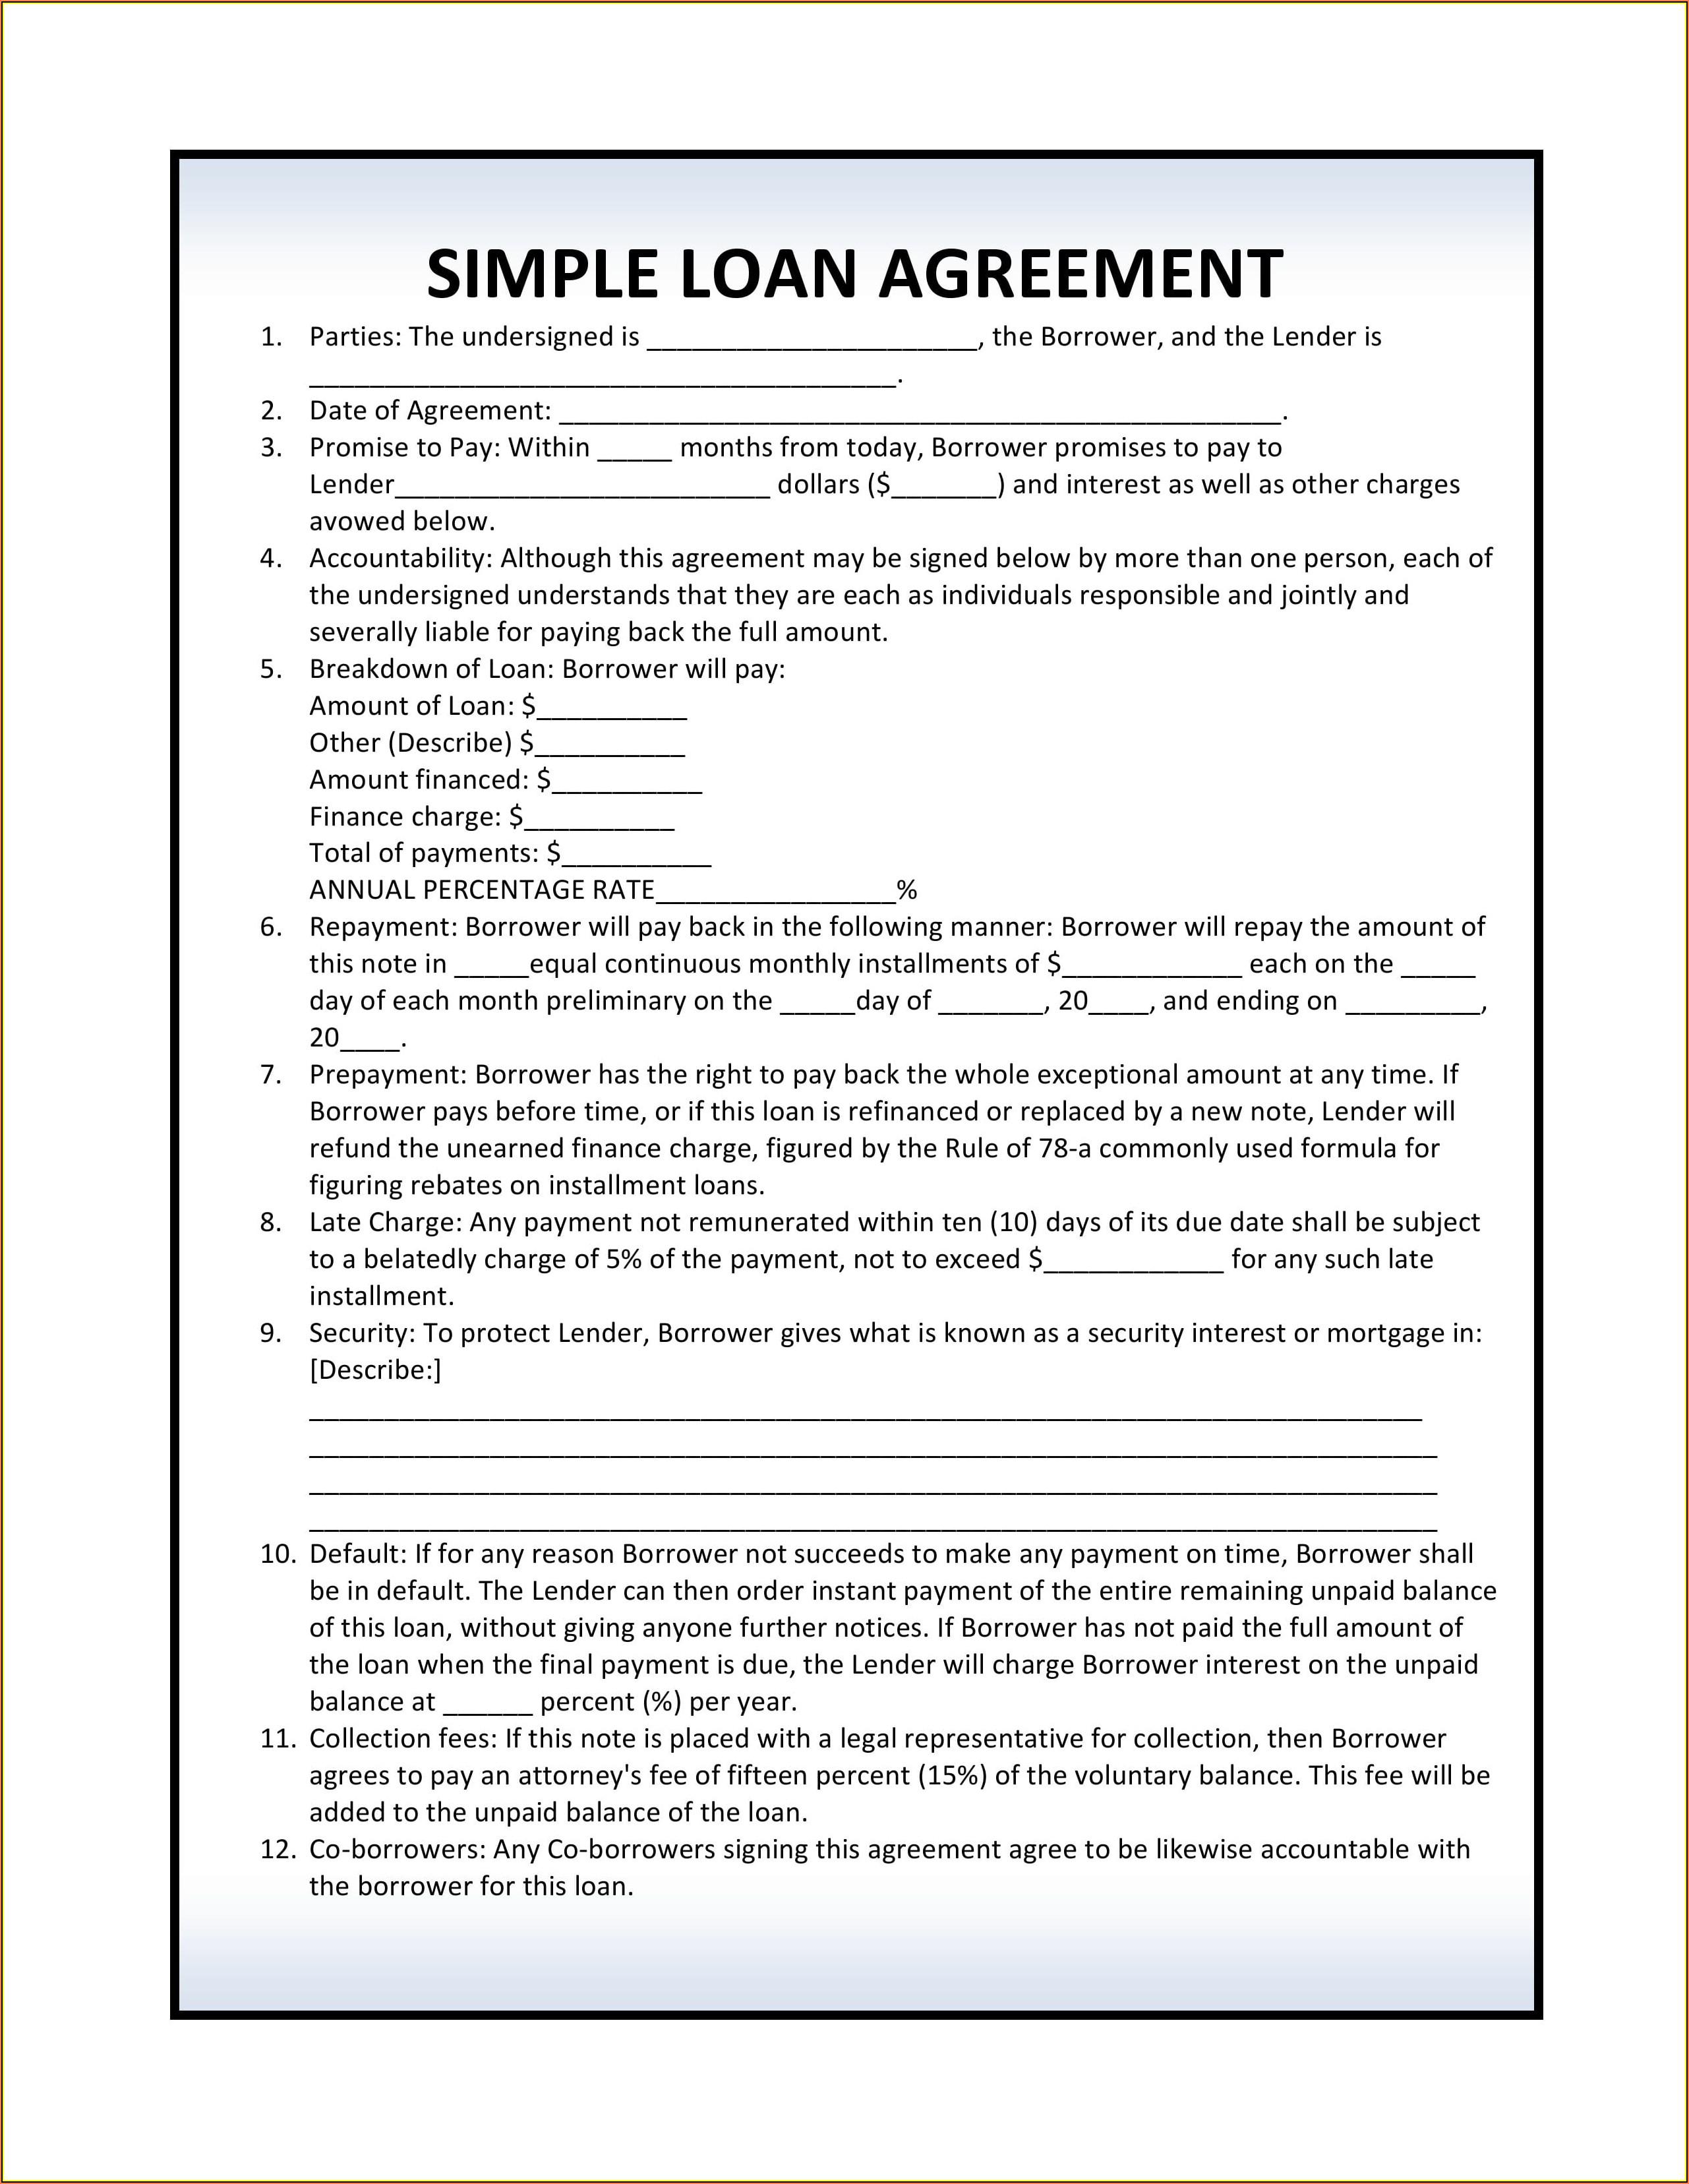 Simple Loan Agreement Form